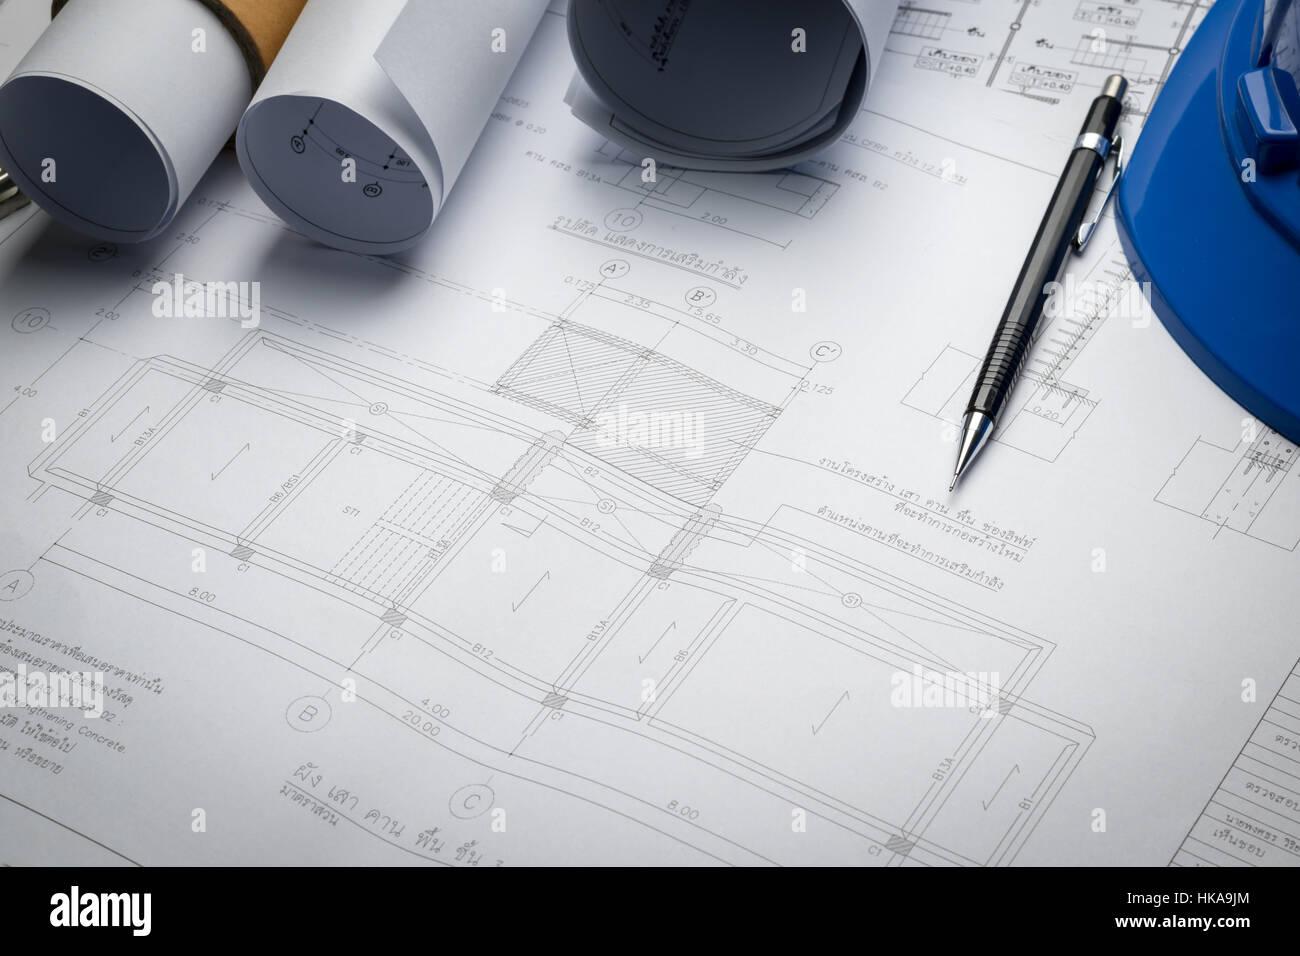 Engineering diagram blueprint paper drafting project sketch stock engineering diagram blueprint paper drafting project sketch architecturalselective focus malvernweather Gallery